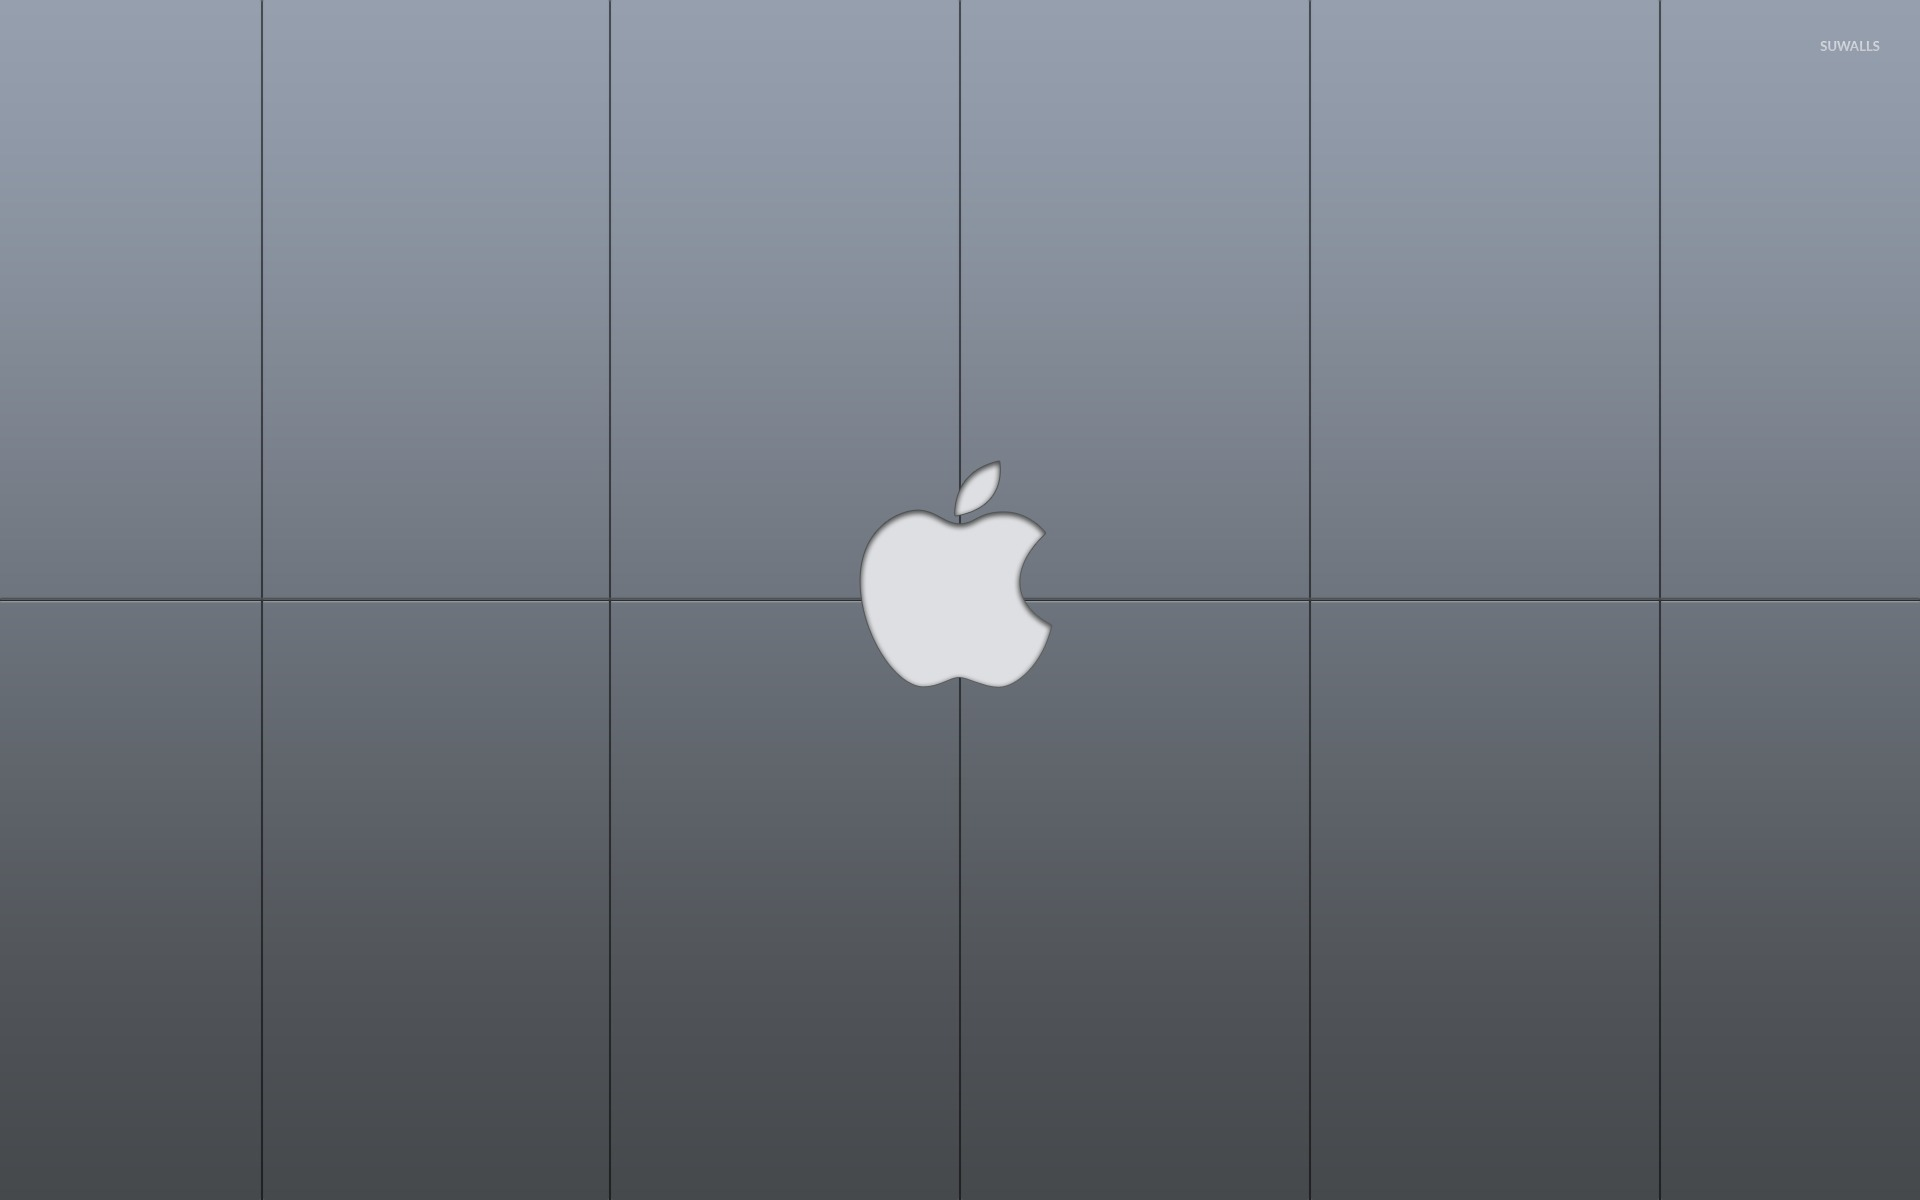 Wonderful Wallpaper Macbook Light - light-gray-apple-logo-53989-1920x1200  Collection_275322.jpg